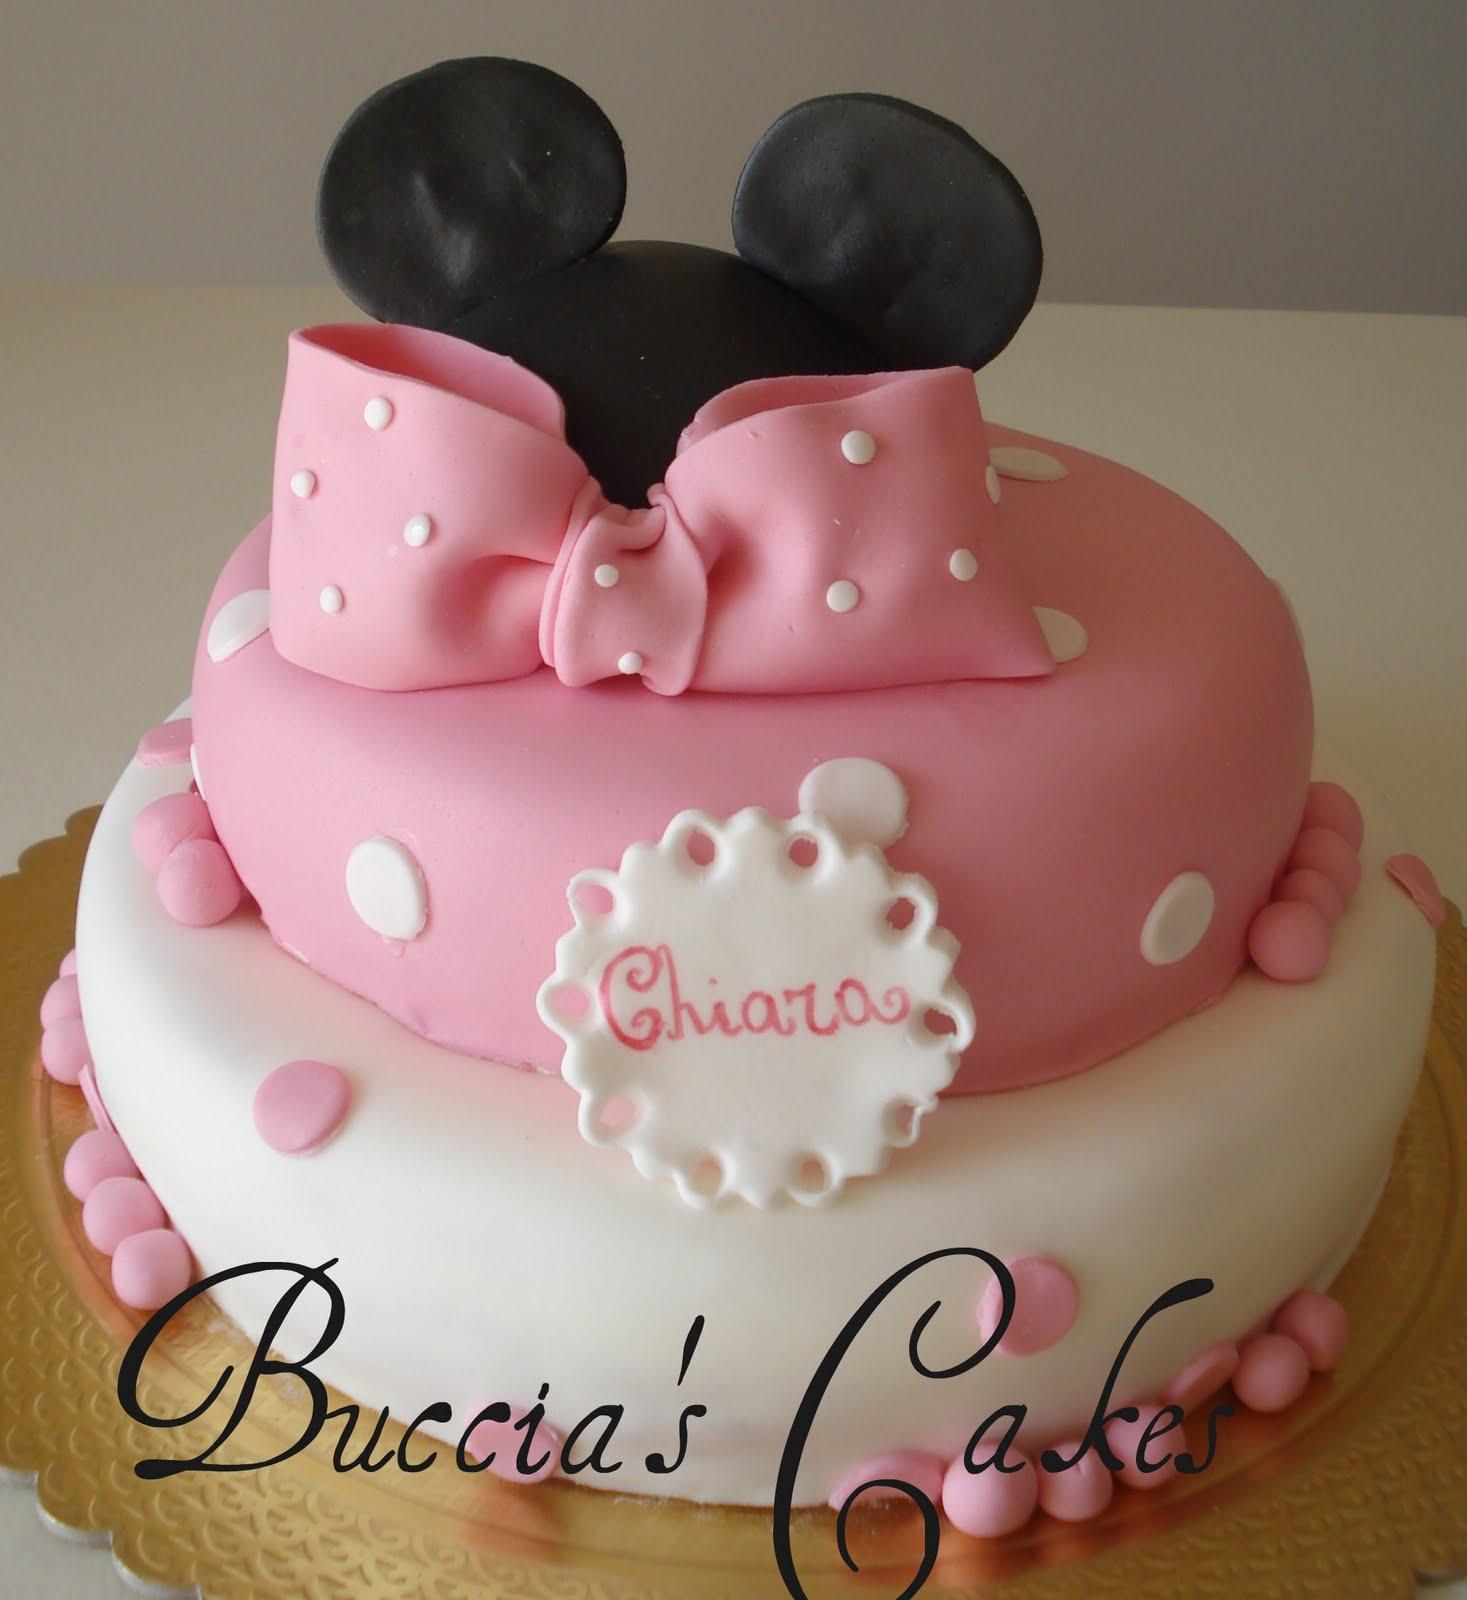 Favoloso Buccia's Cakes: Torta Minnie XY29